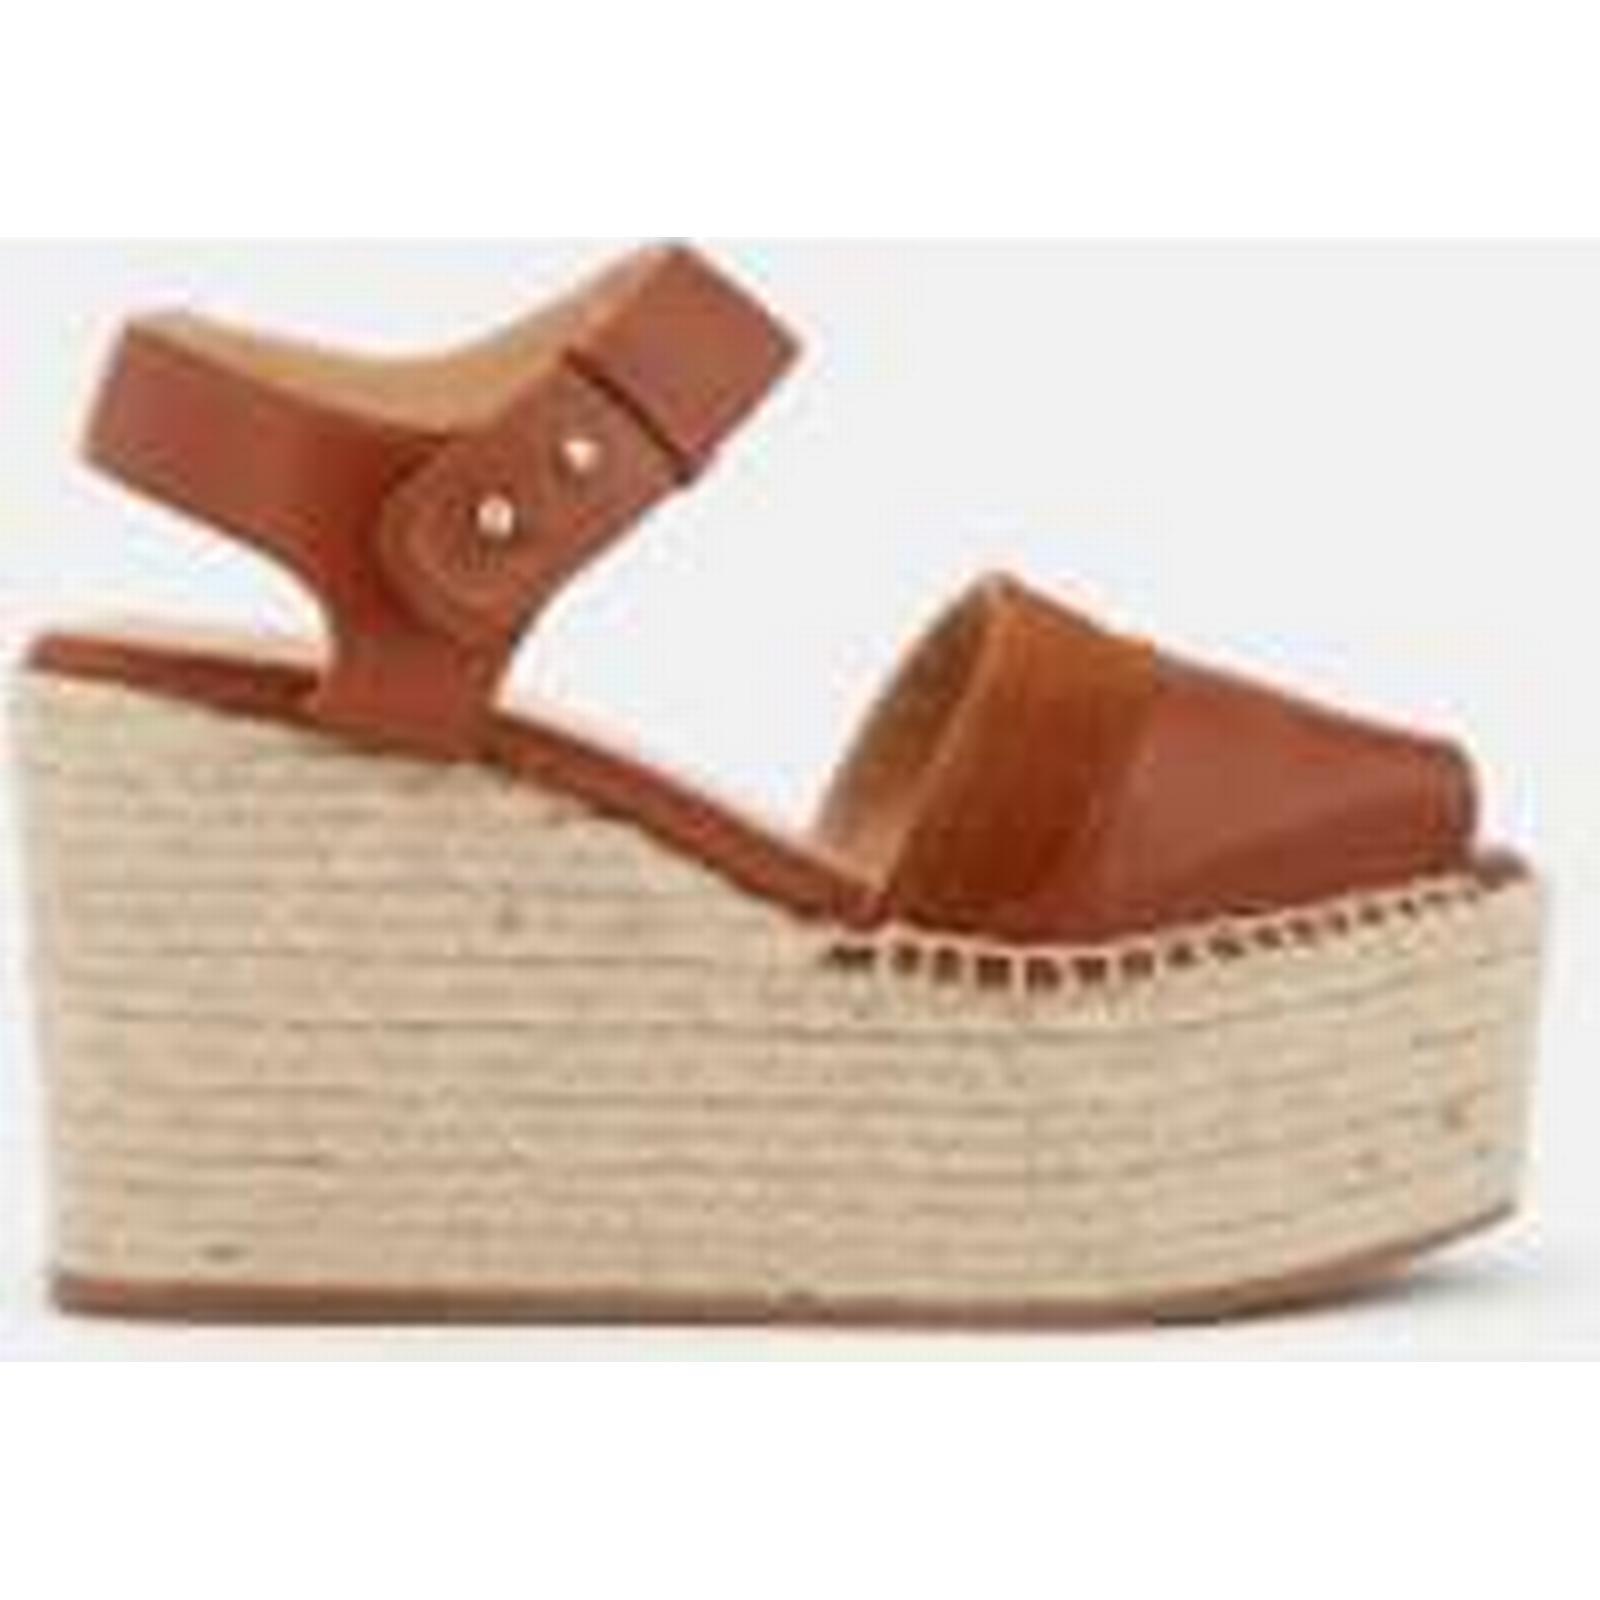 Castañer Women's Enea Leather - Wedged Sandals - Cuero - Leather UK 3 - Tan 6b286b